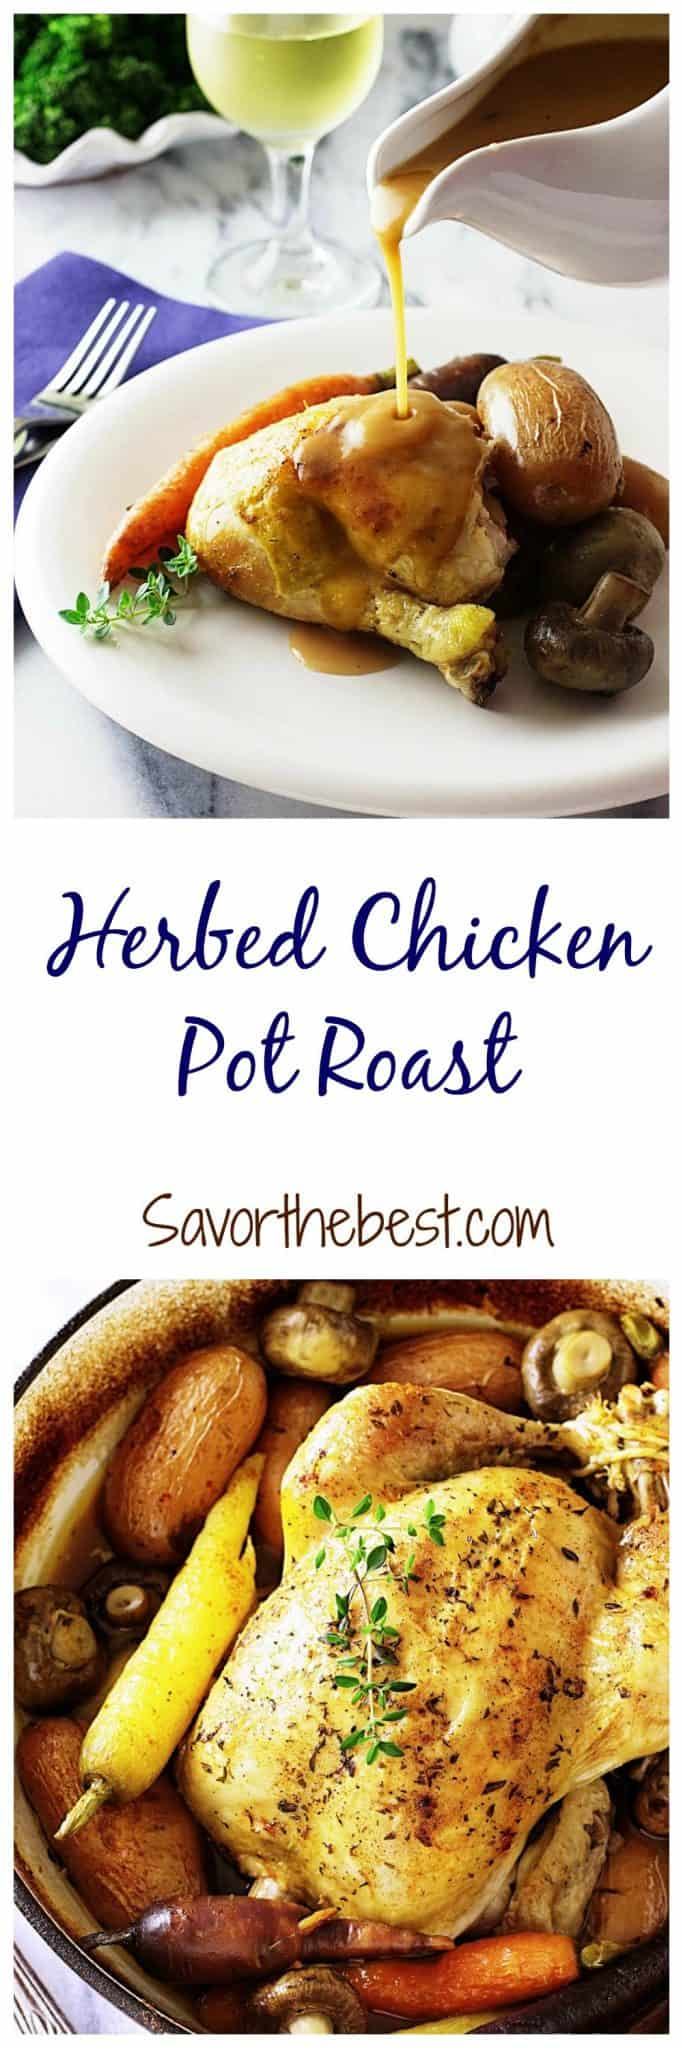 Pot Roasted Herb Chicken